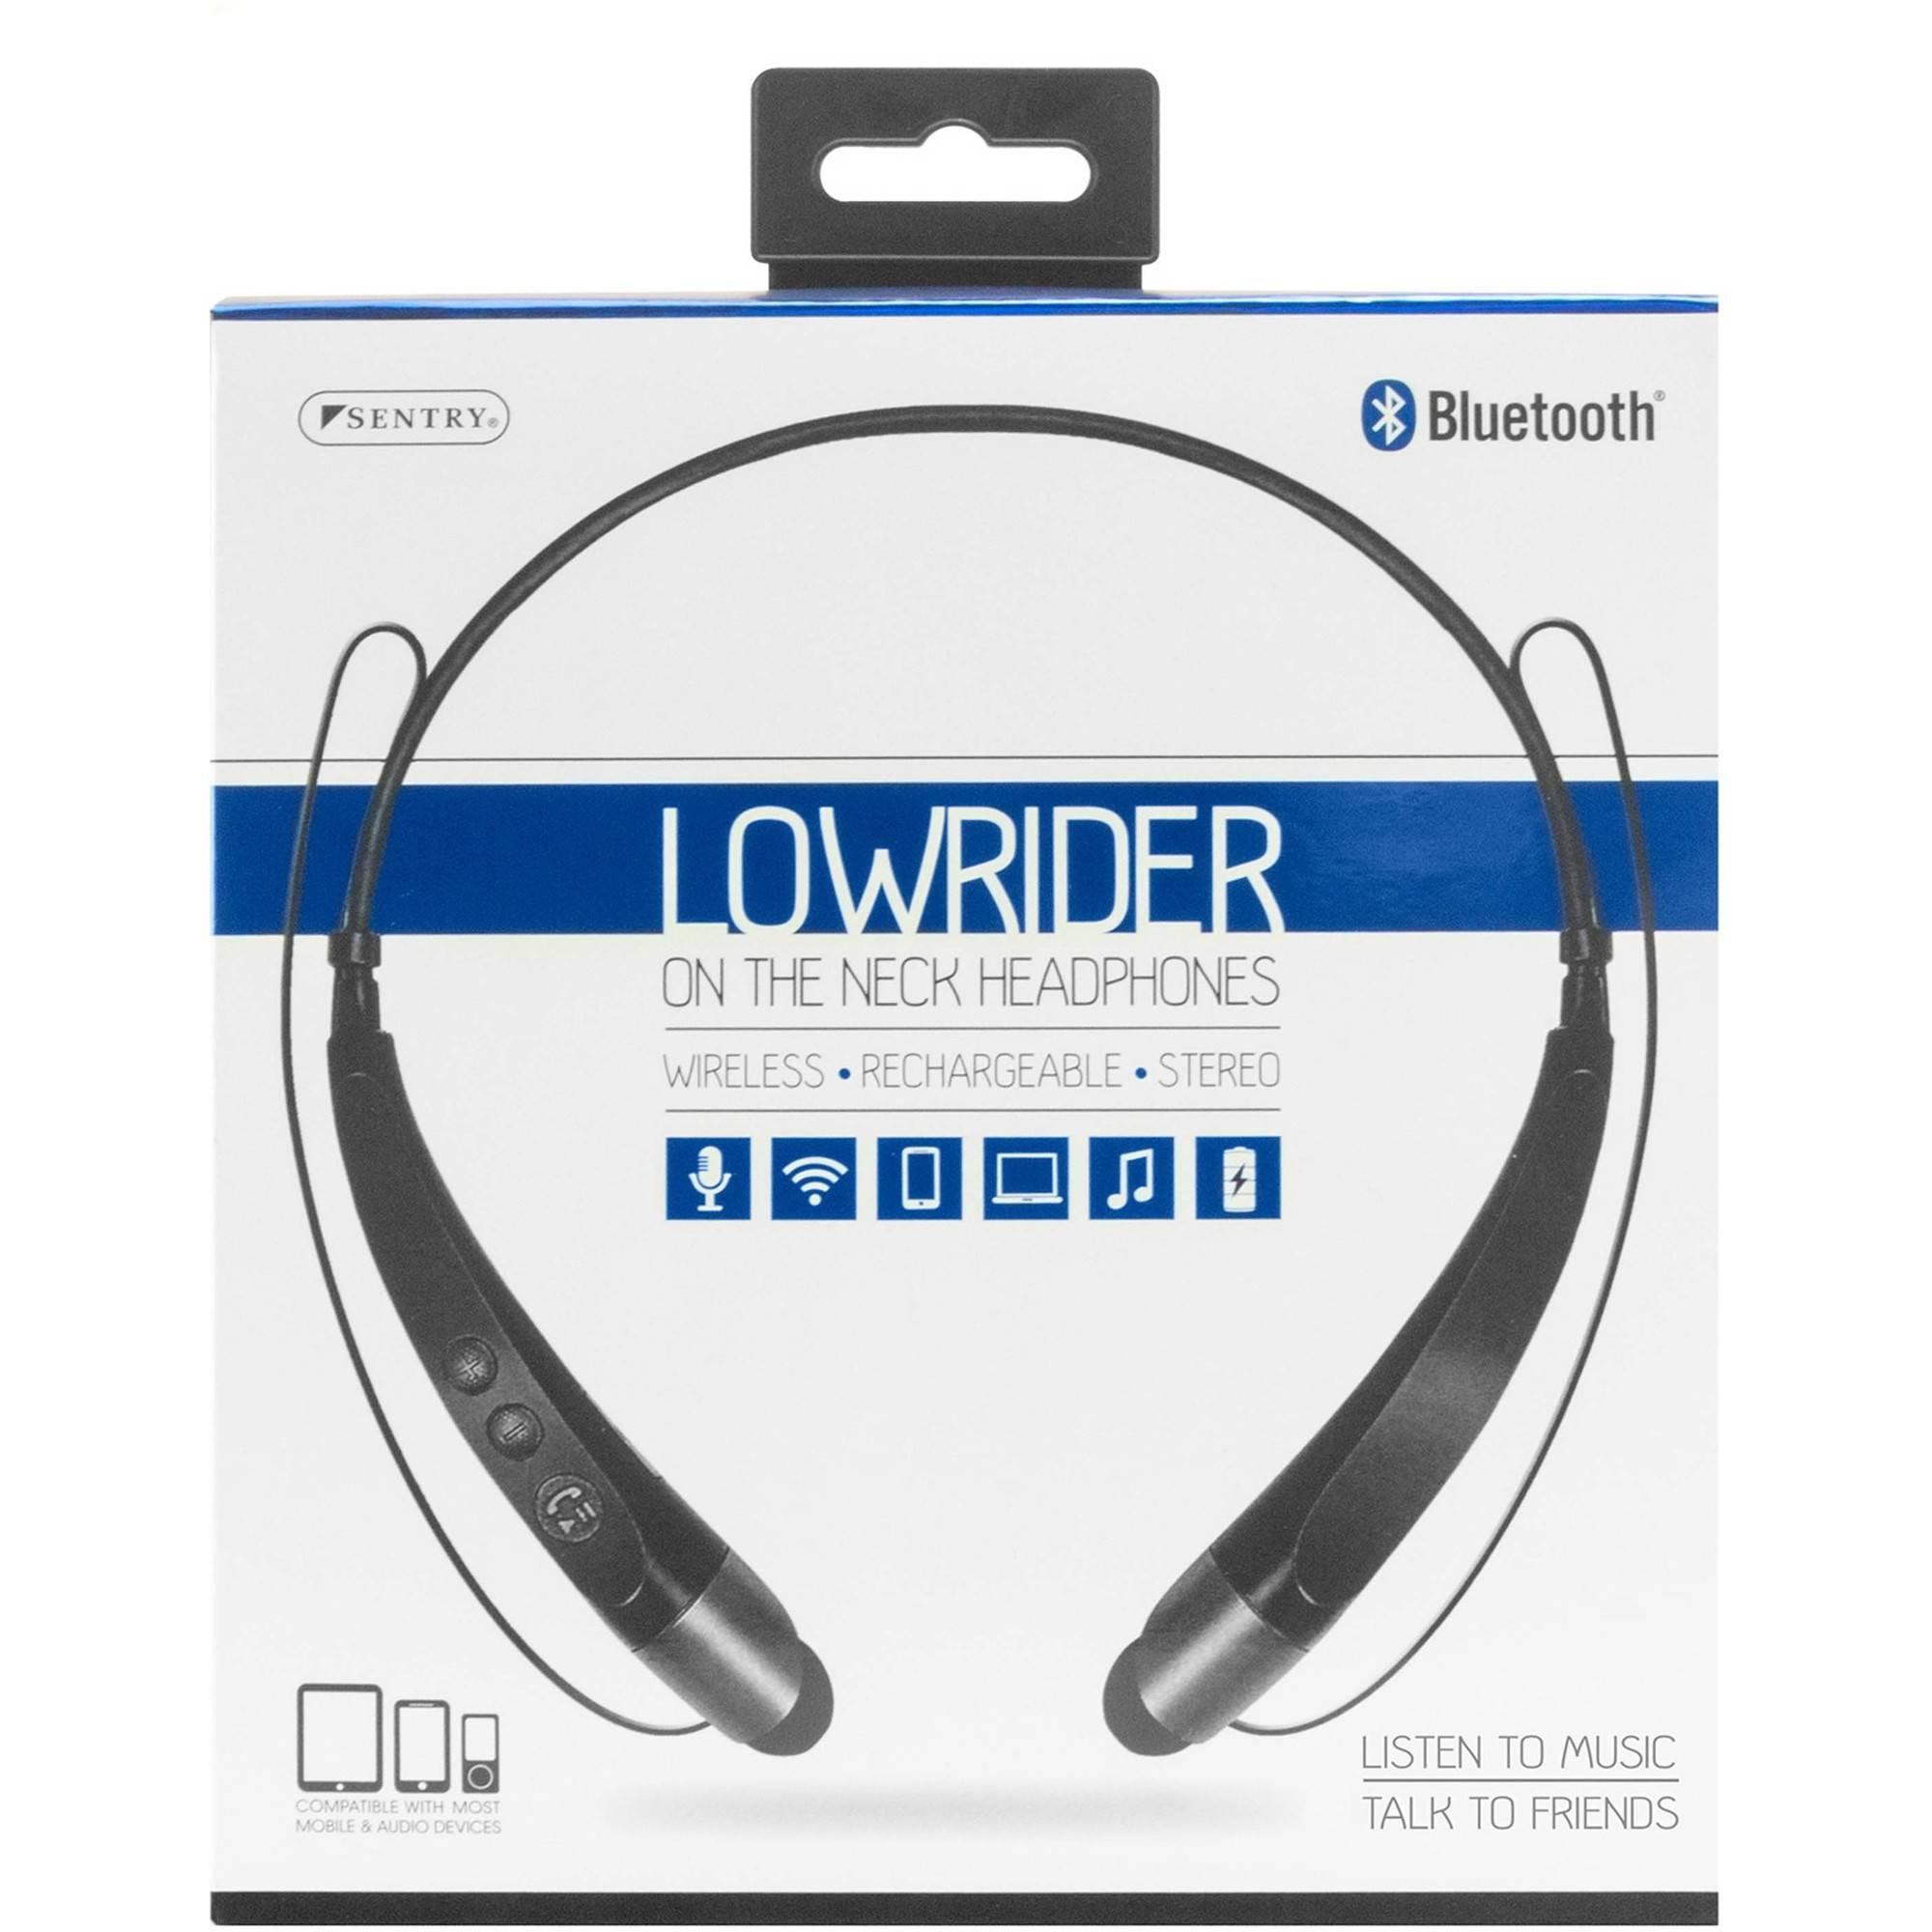 aa36305abbd Sentry Bluetooth Lowrider On-the-Neck Headphones - Walmart.com